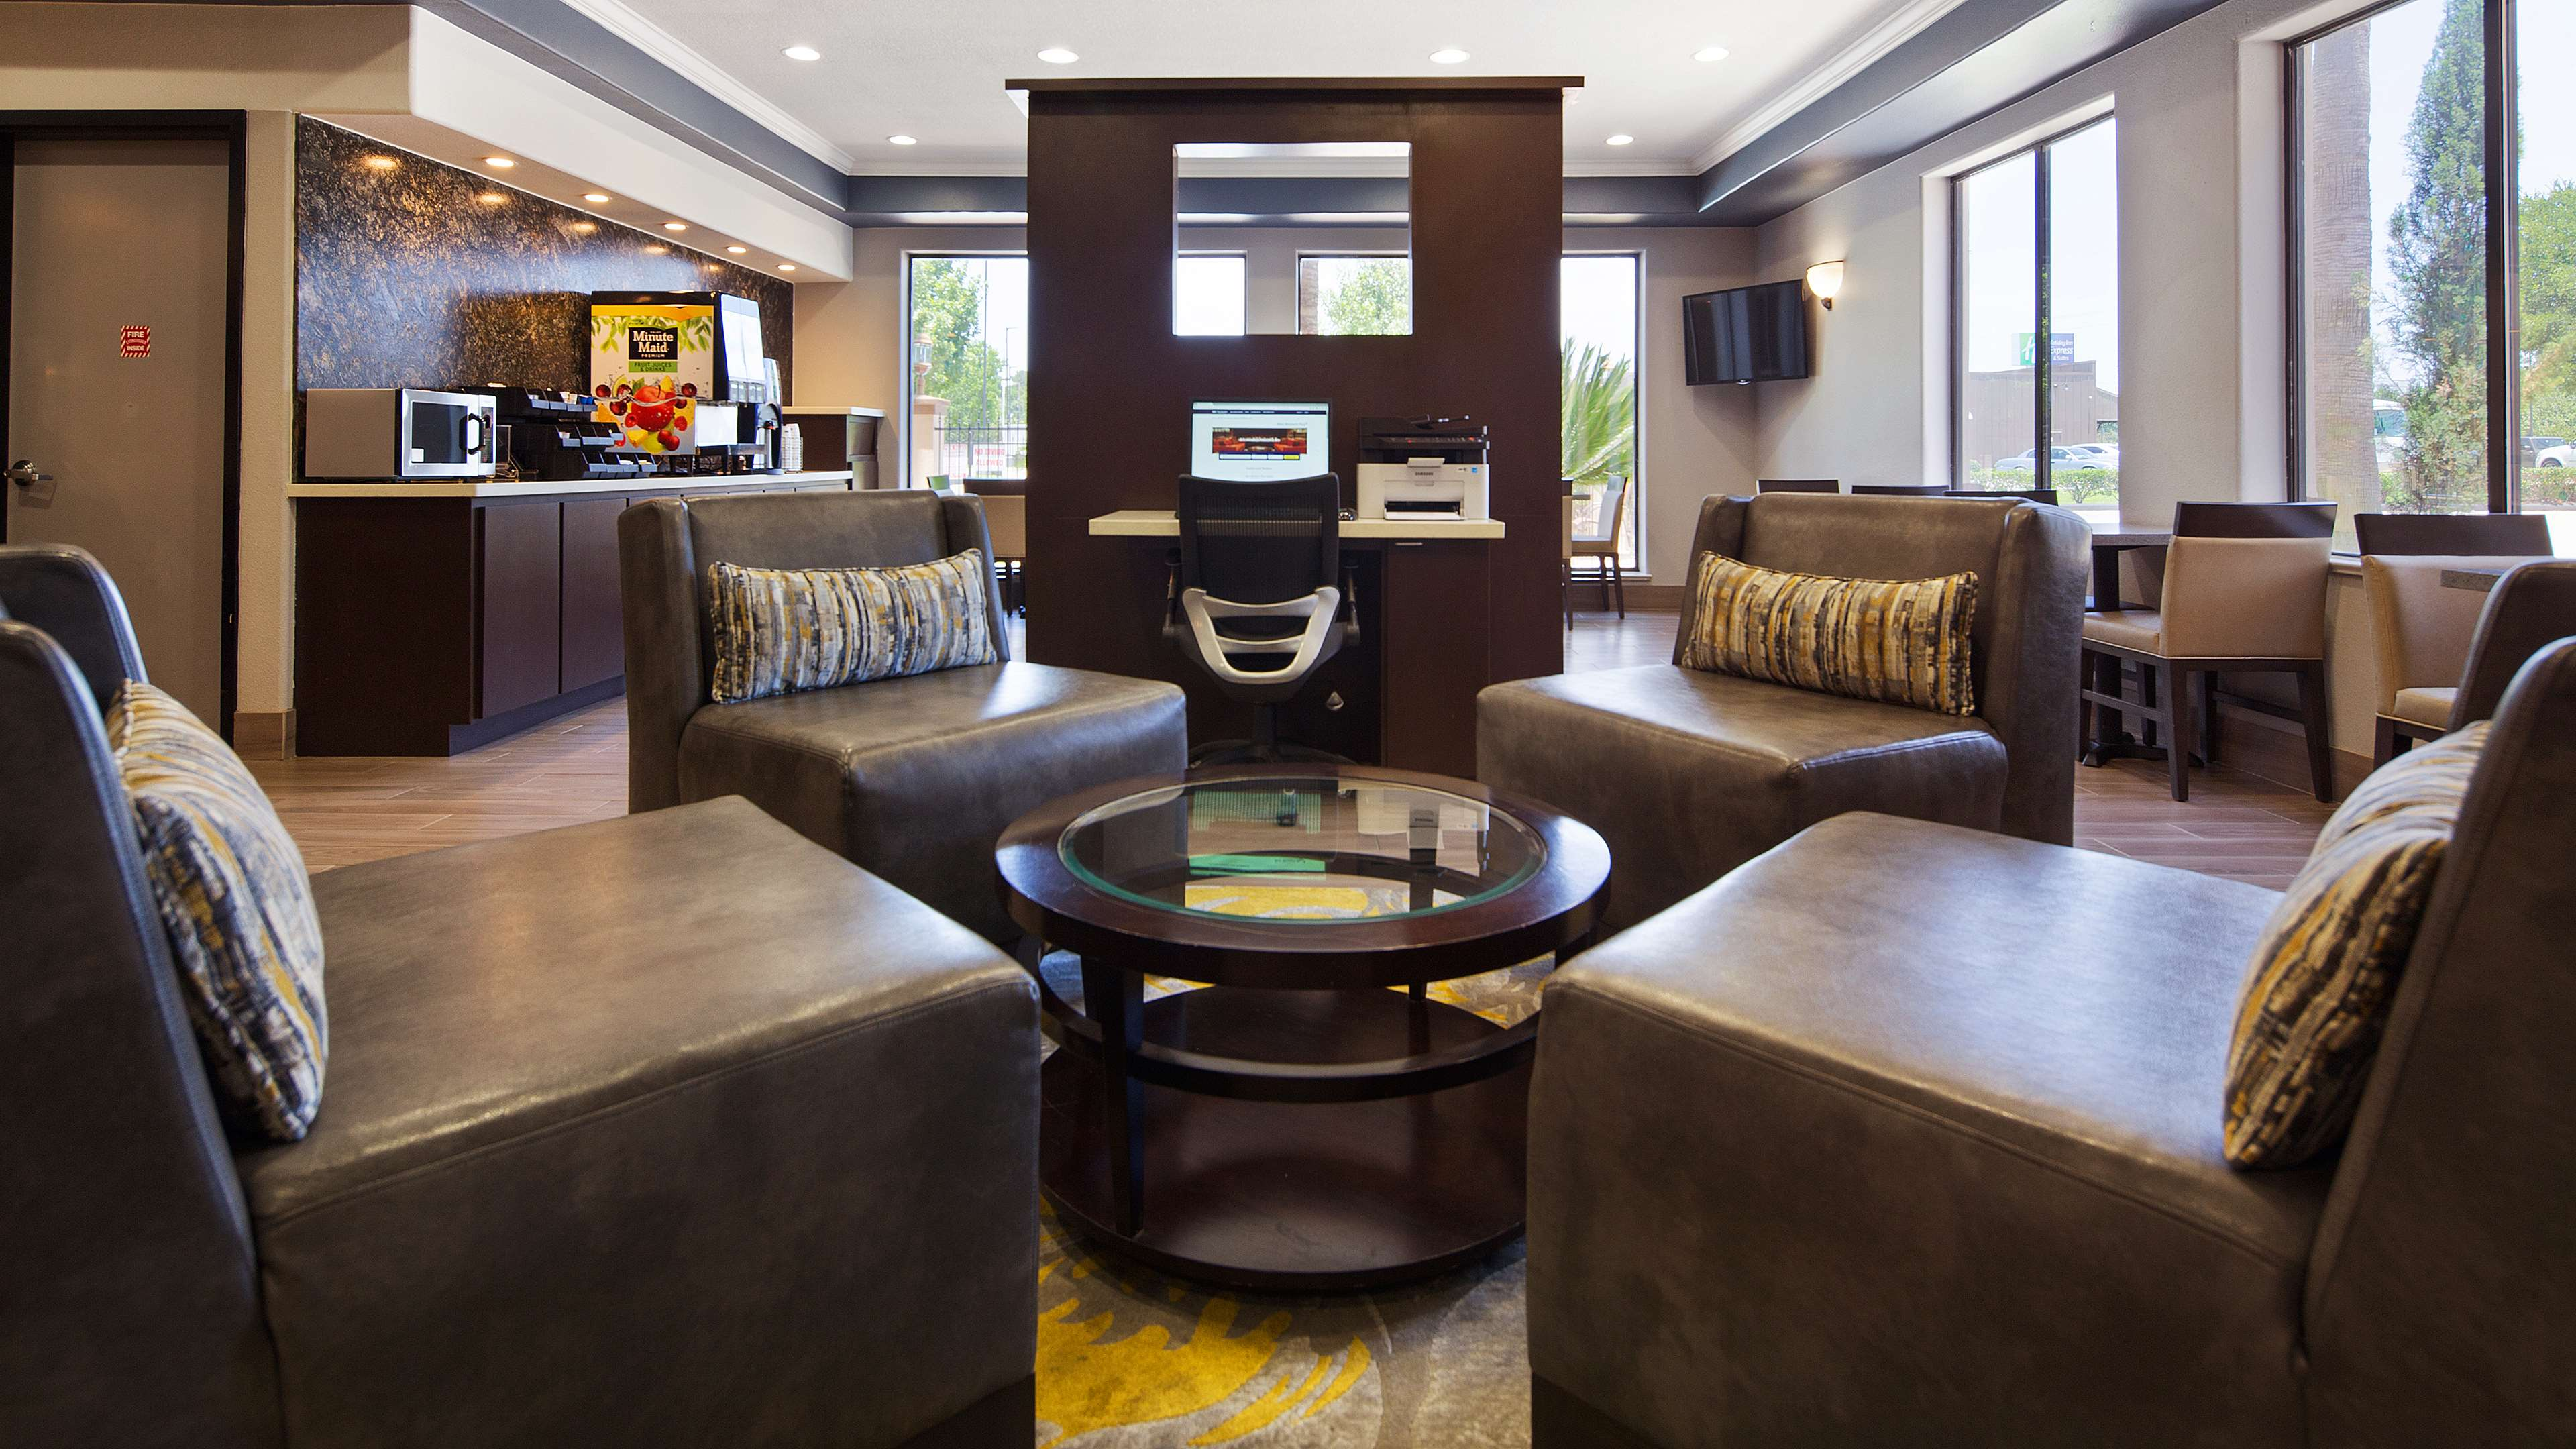 Best Western Plus North Houston Inn & Suites image 2